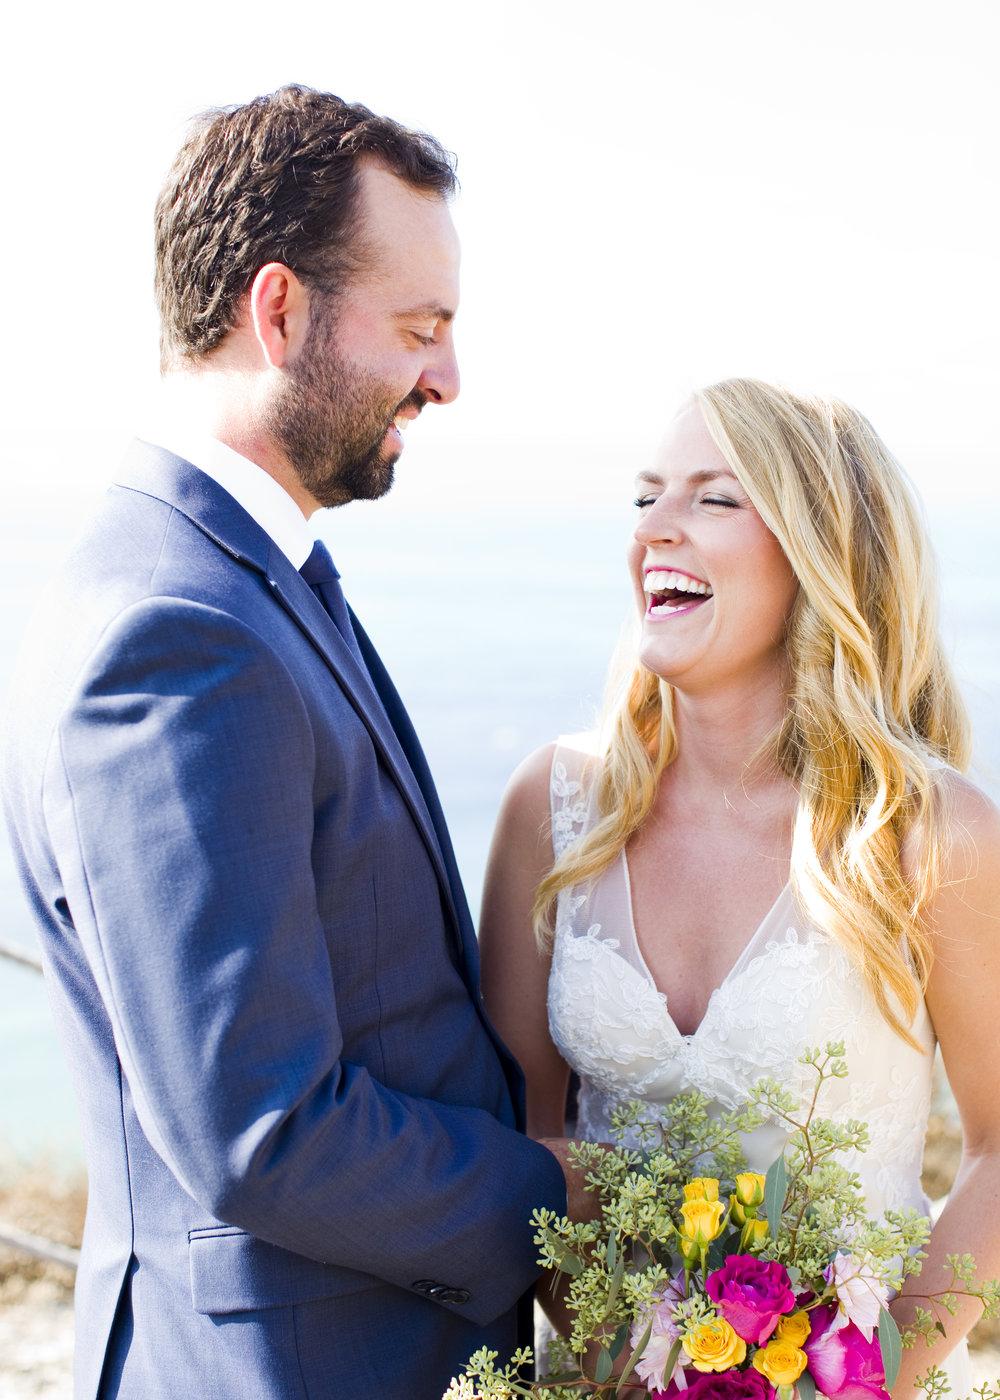 Martin-Johnson-House-Wedding-San-Diego-Wedding-Photographer-La-Jolla_014.JPG